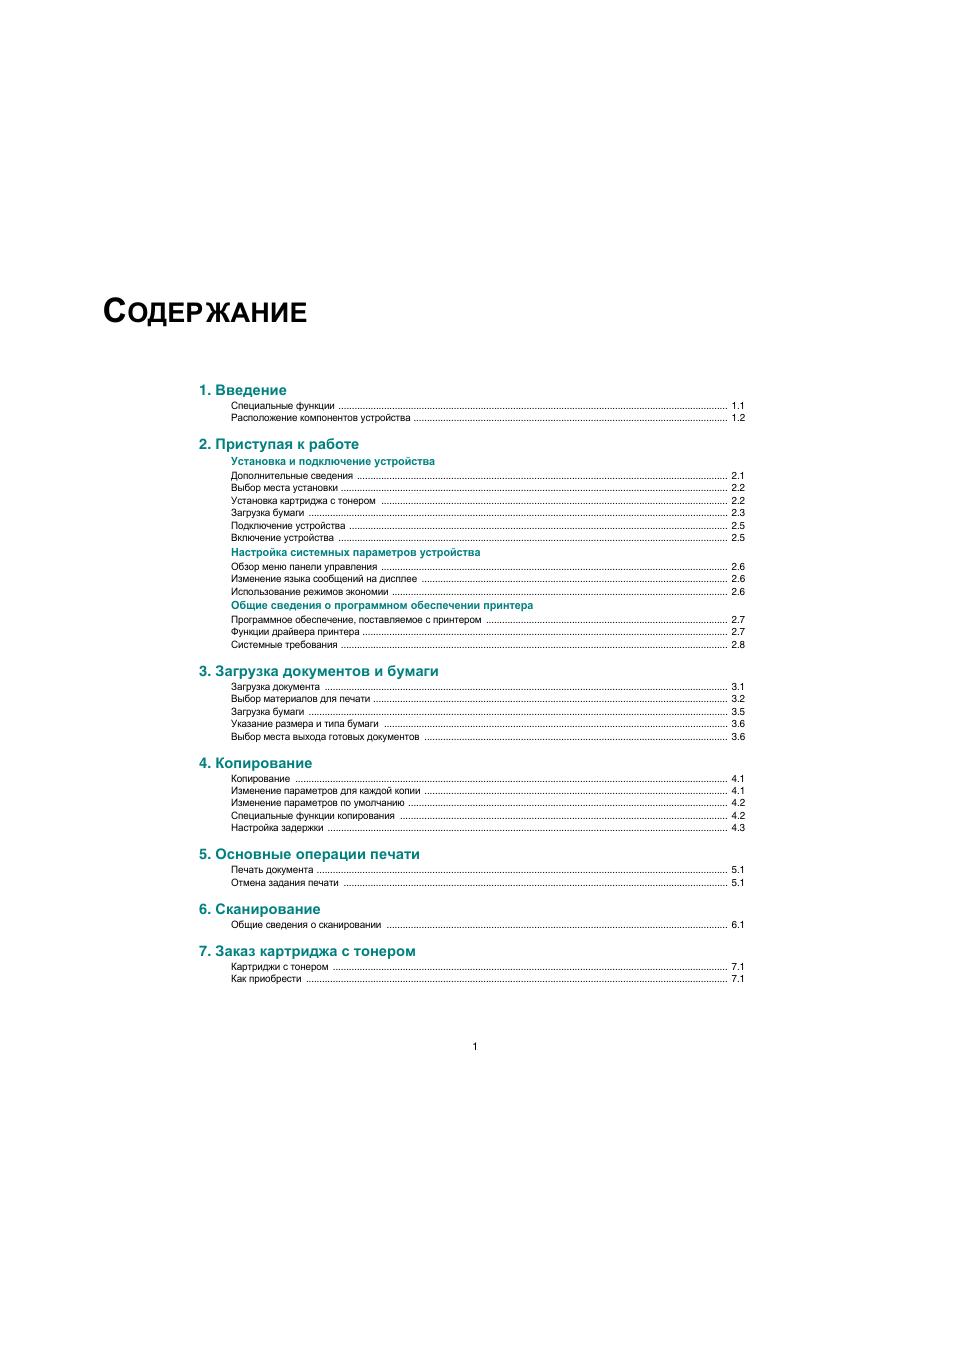 Инструкция по эксплуатации Xerox WorkCentre 3119